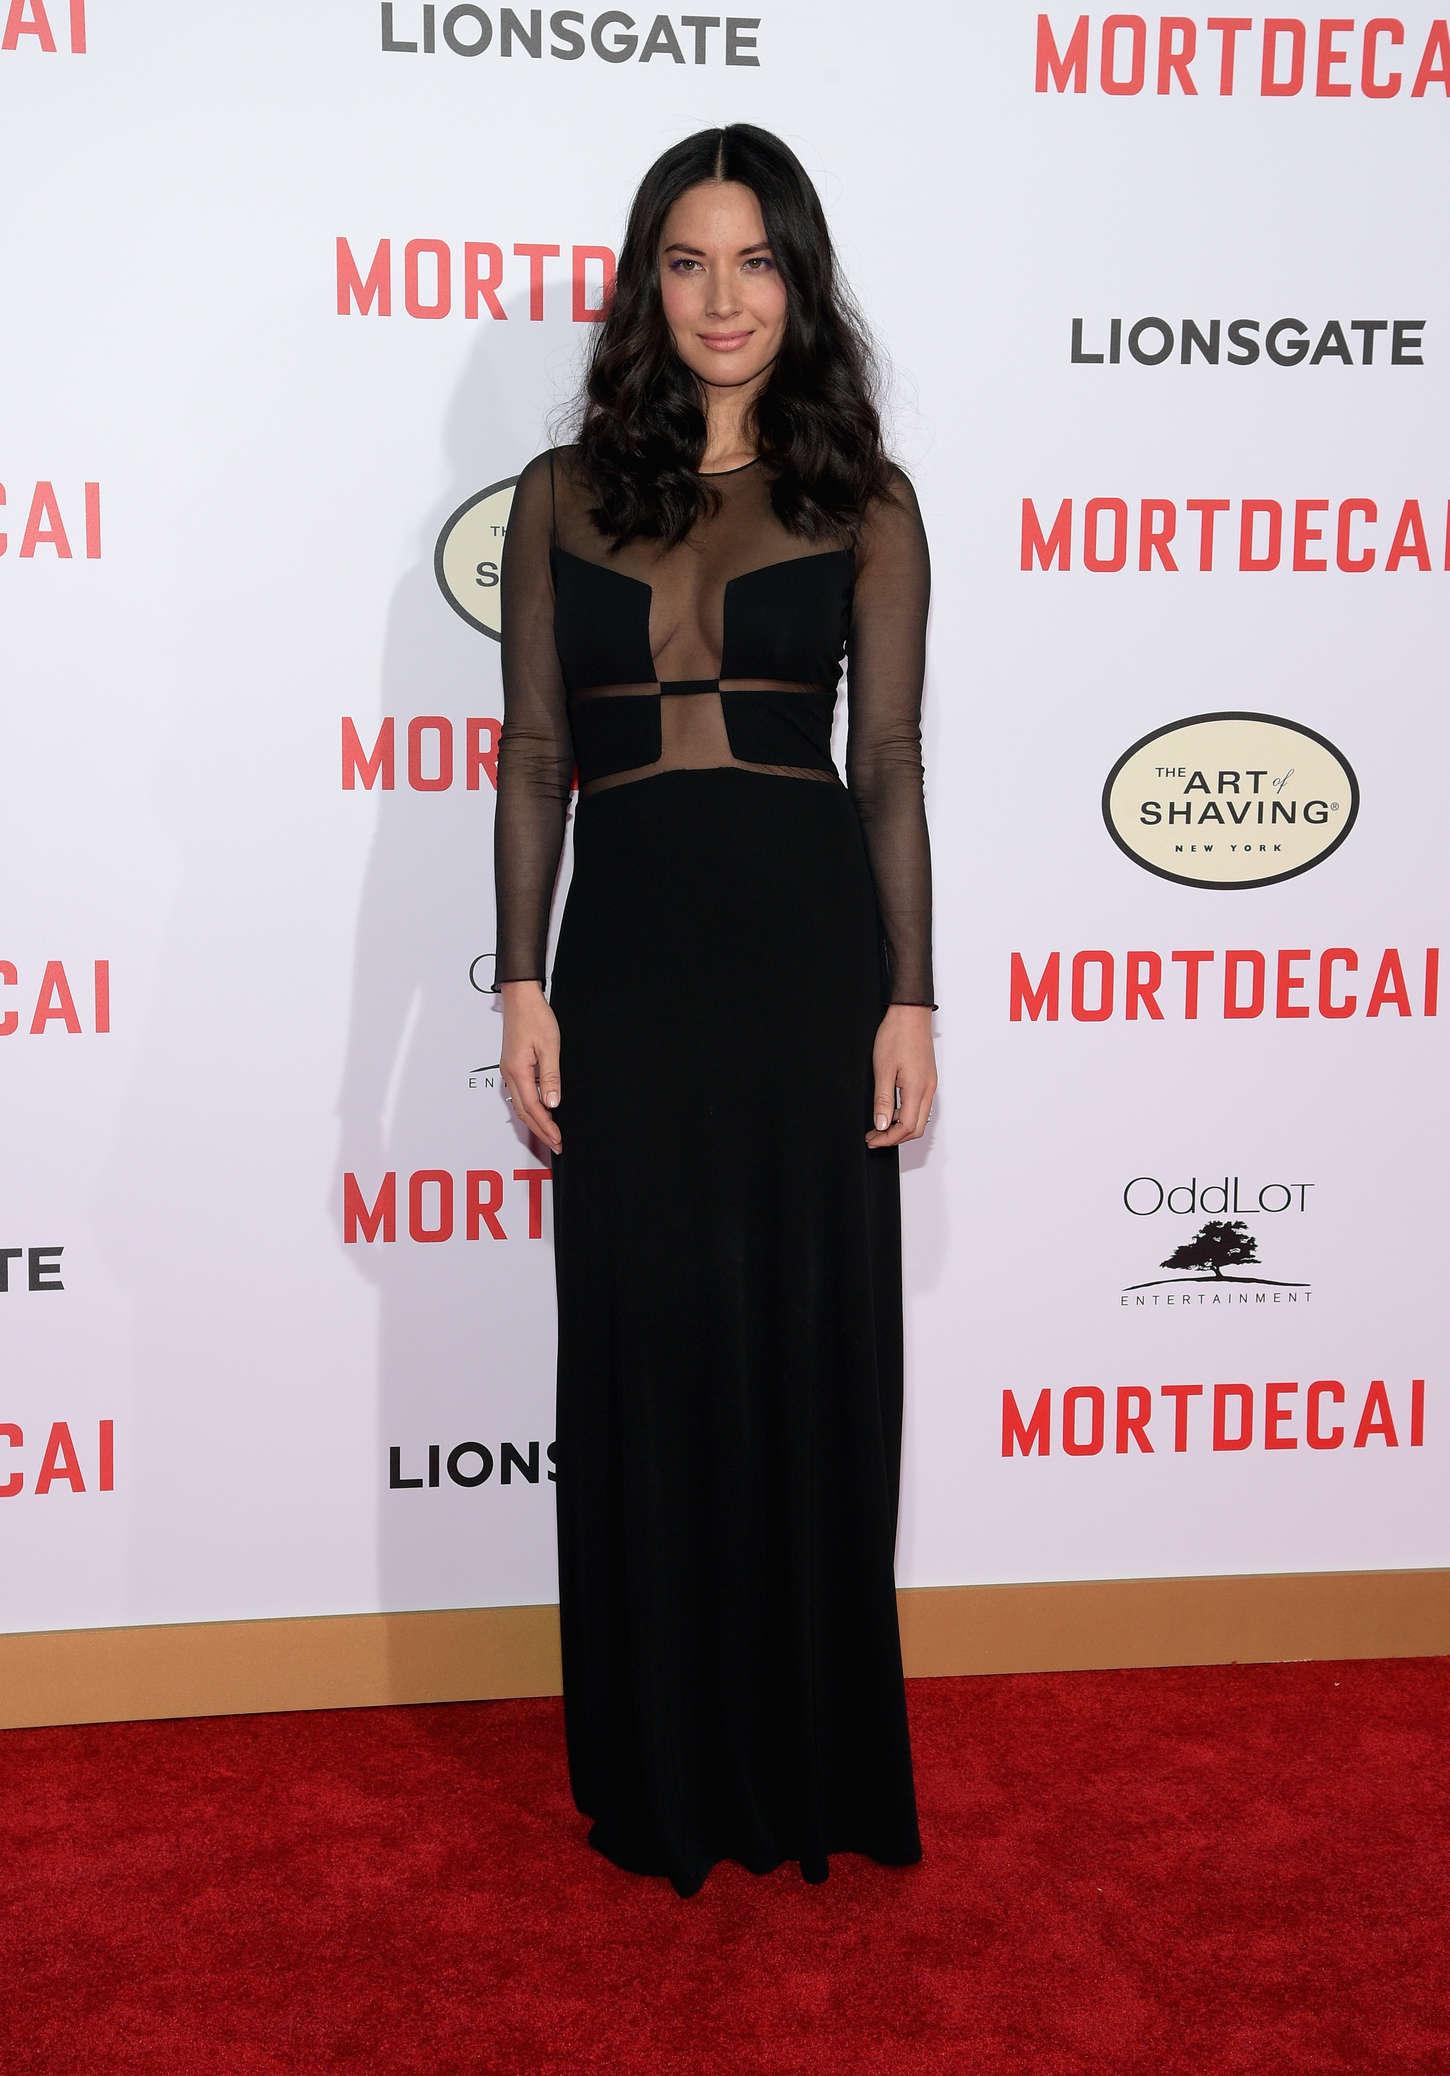 Olivia Munn 2015 : Olivia Munn: Mortdecai LA Premiere -21